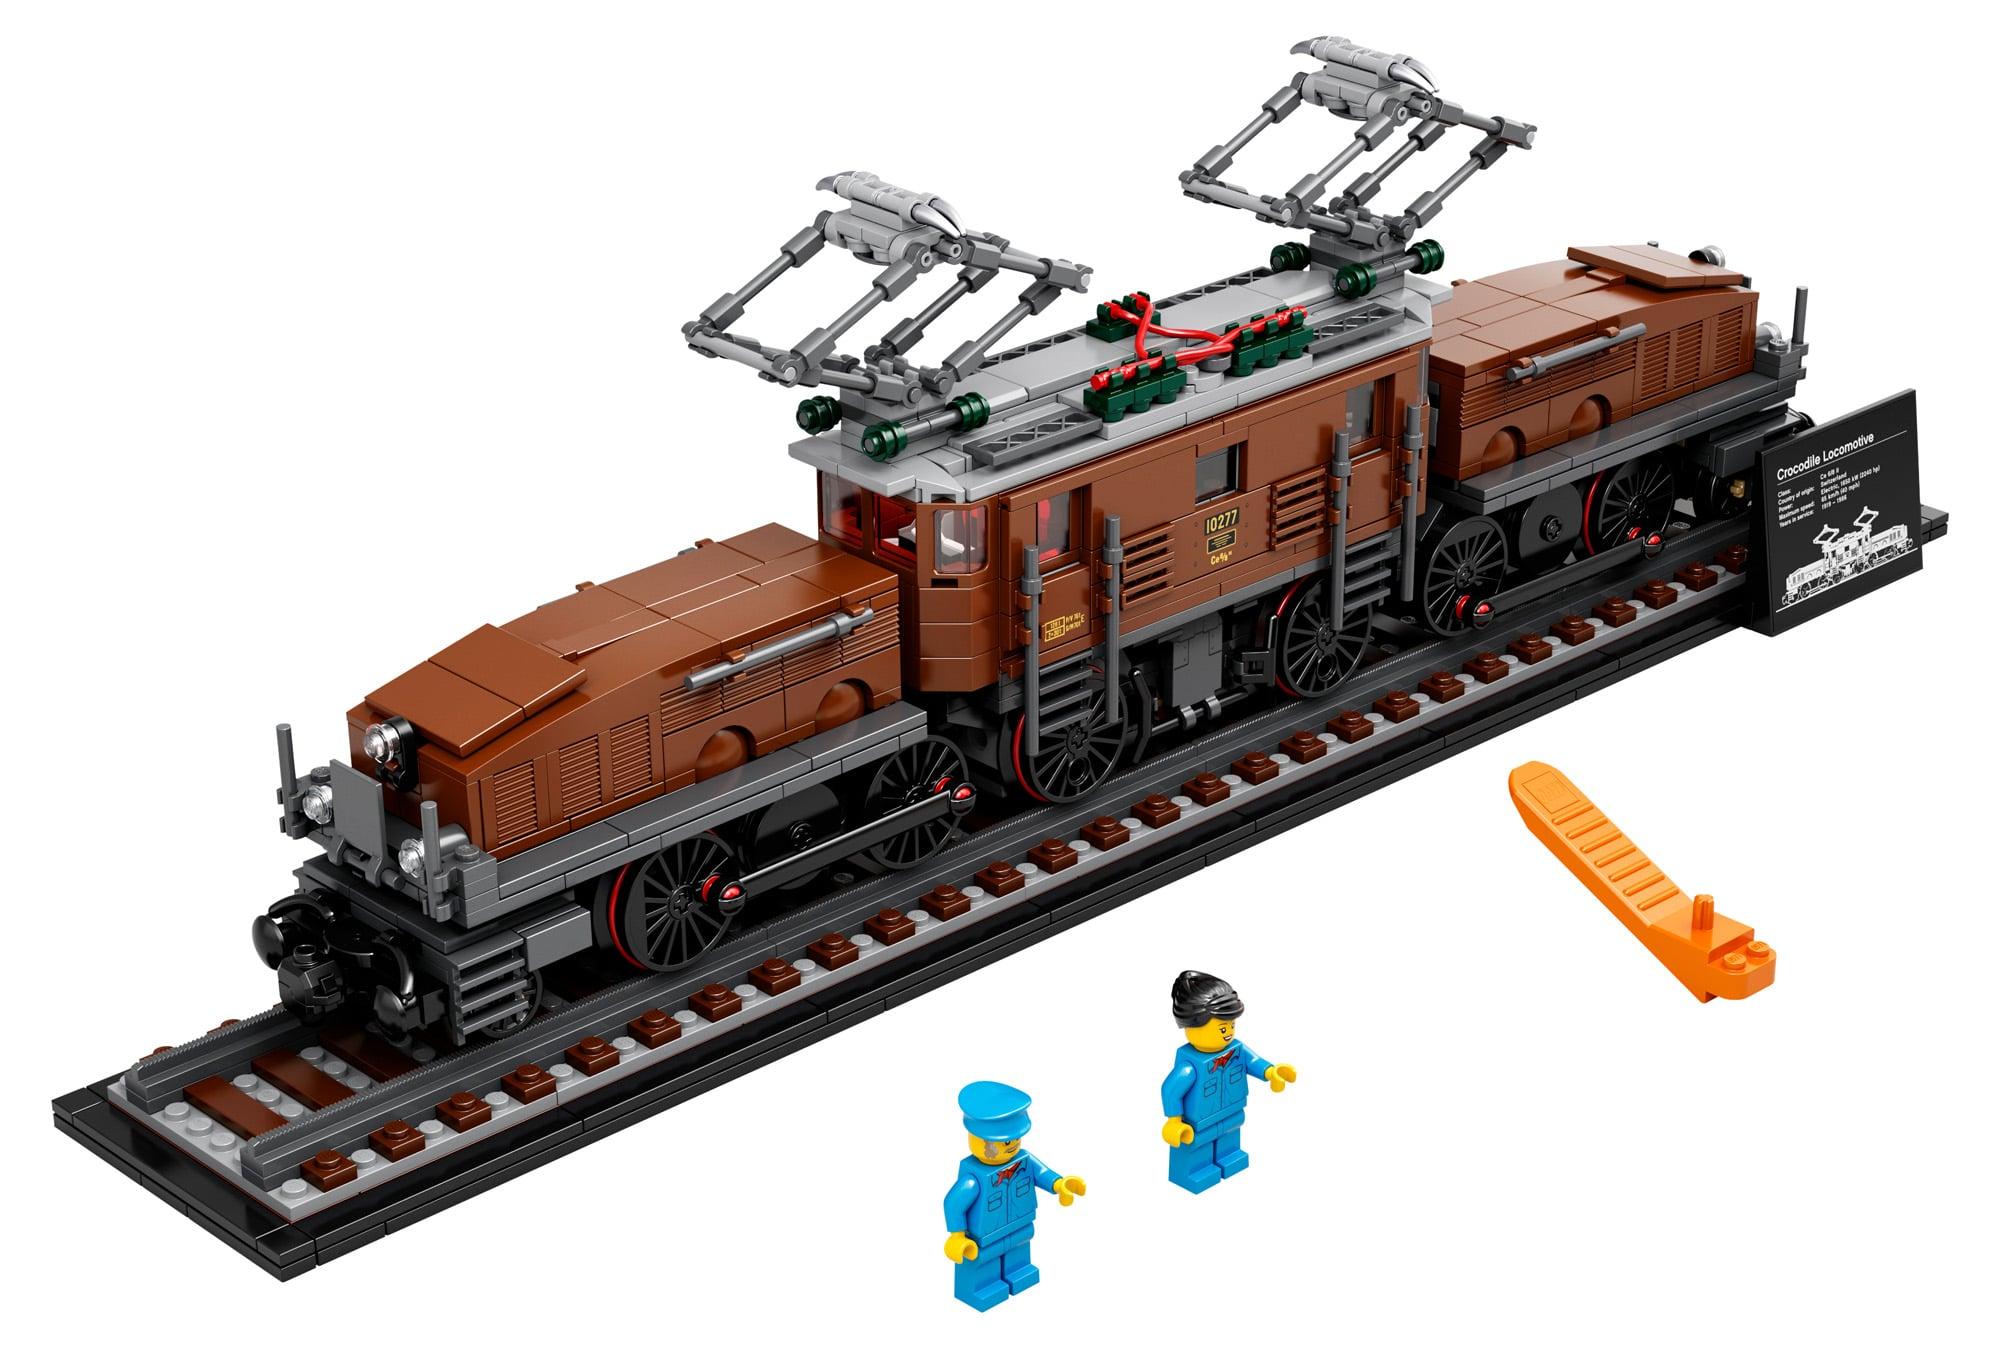 LEGO 10277 Krokodil Lokomotive